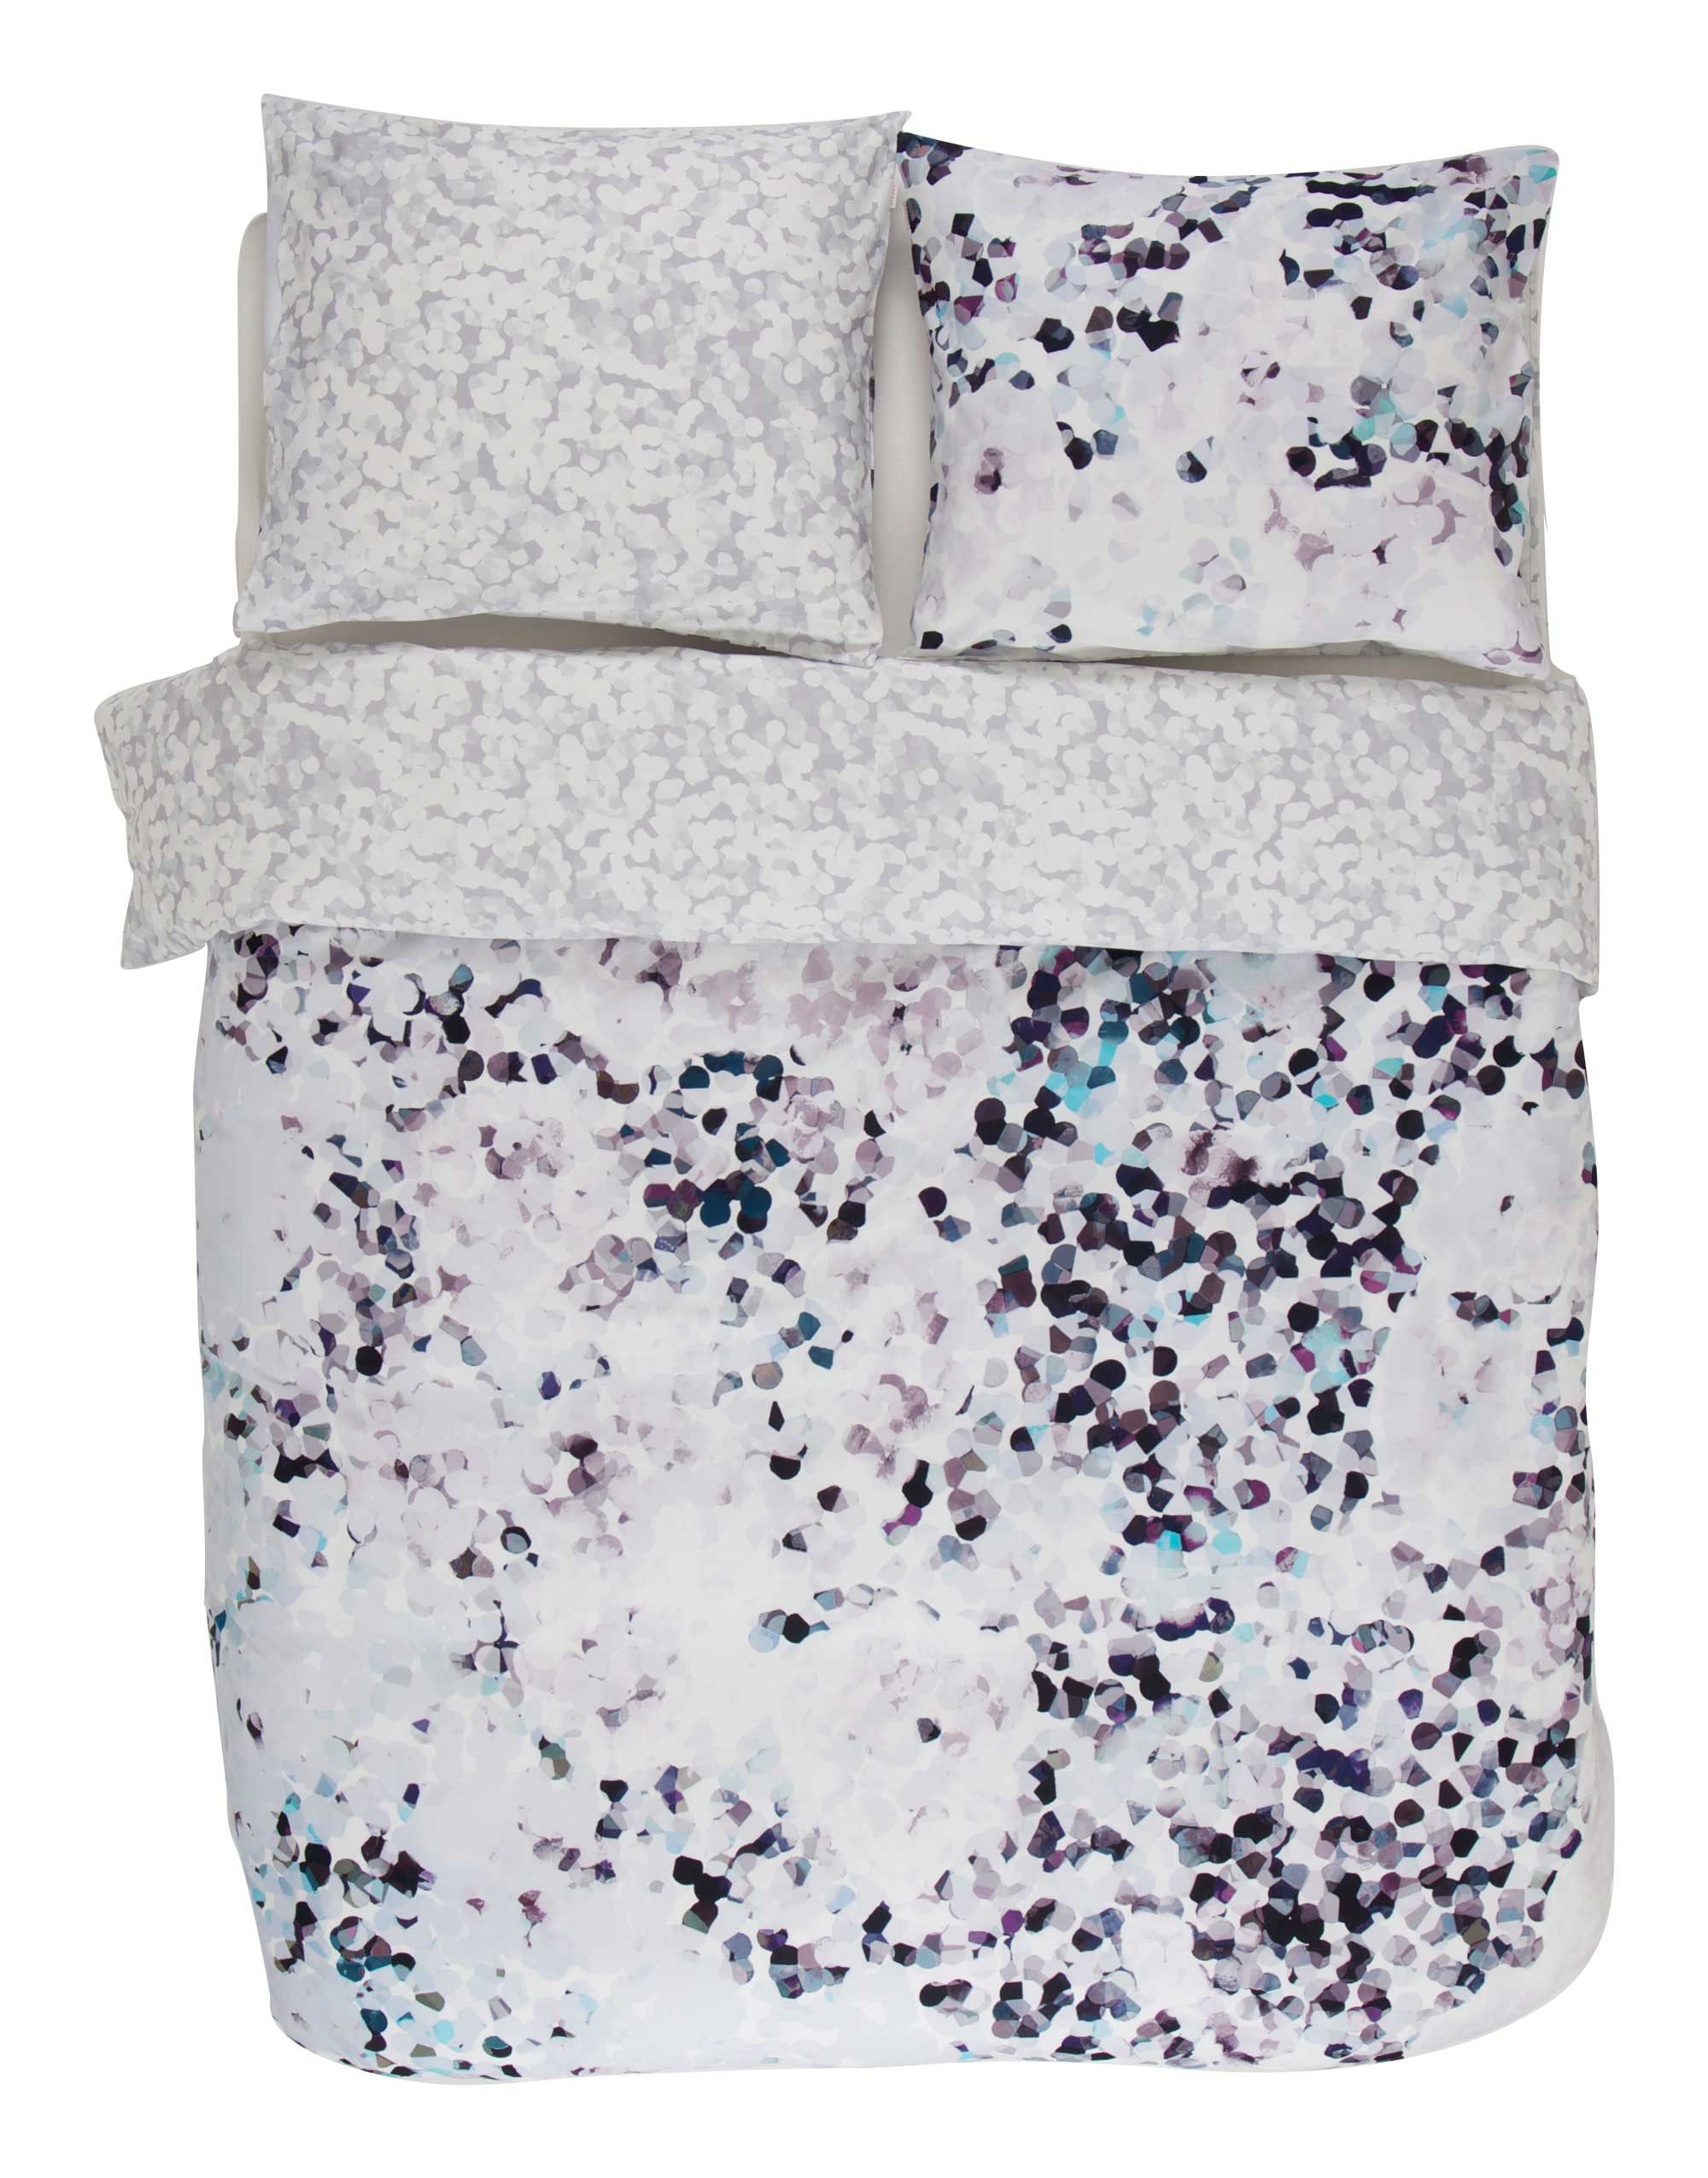 Esprit Coral Grey   Bedroom   Pinterest   Coral duvet, Duvet and ... : esprit quilt covers - Adamdwight.com